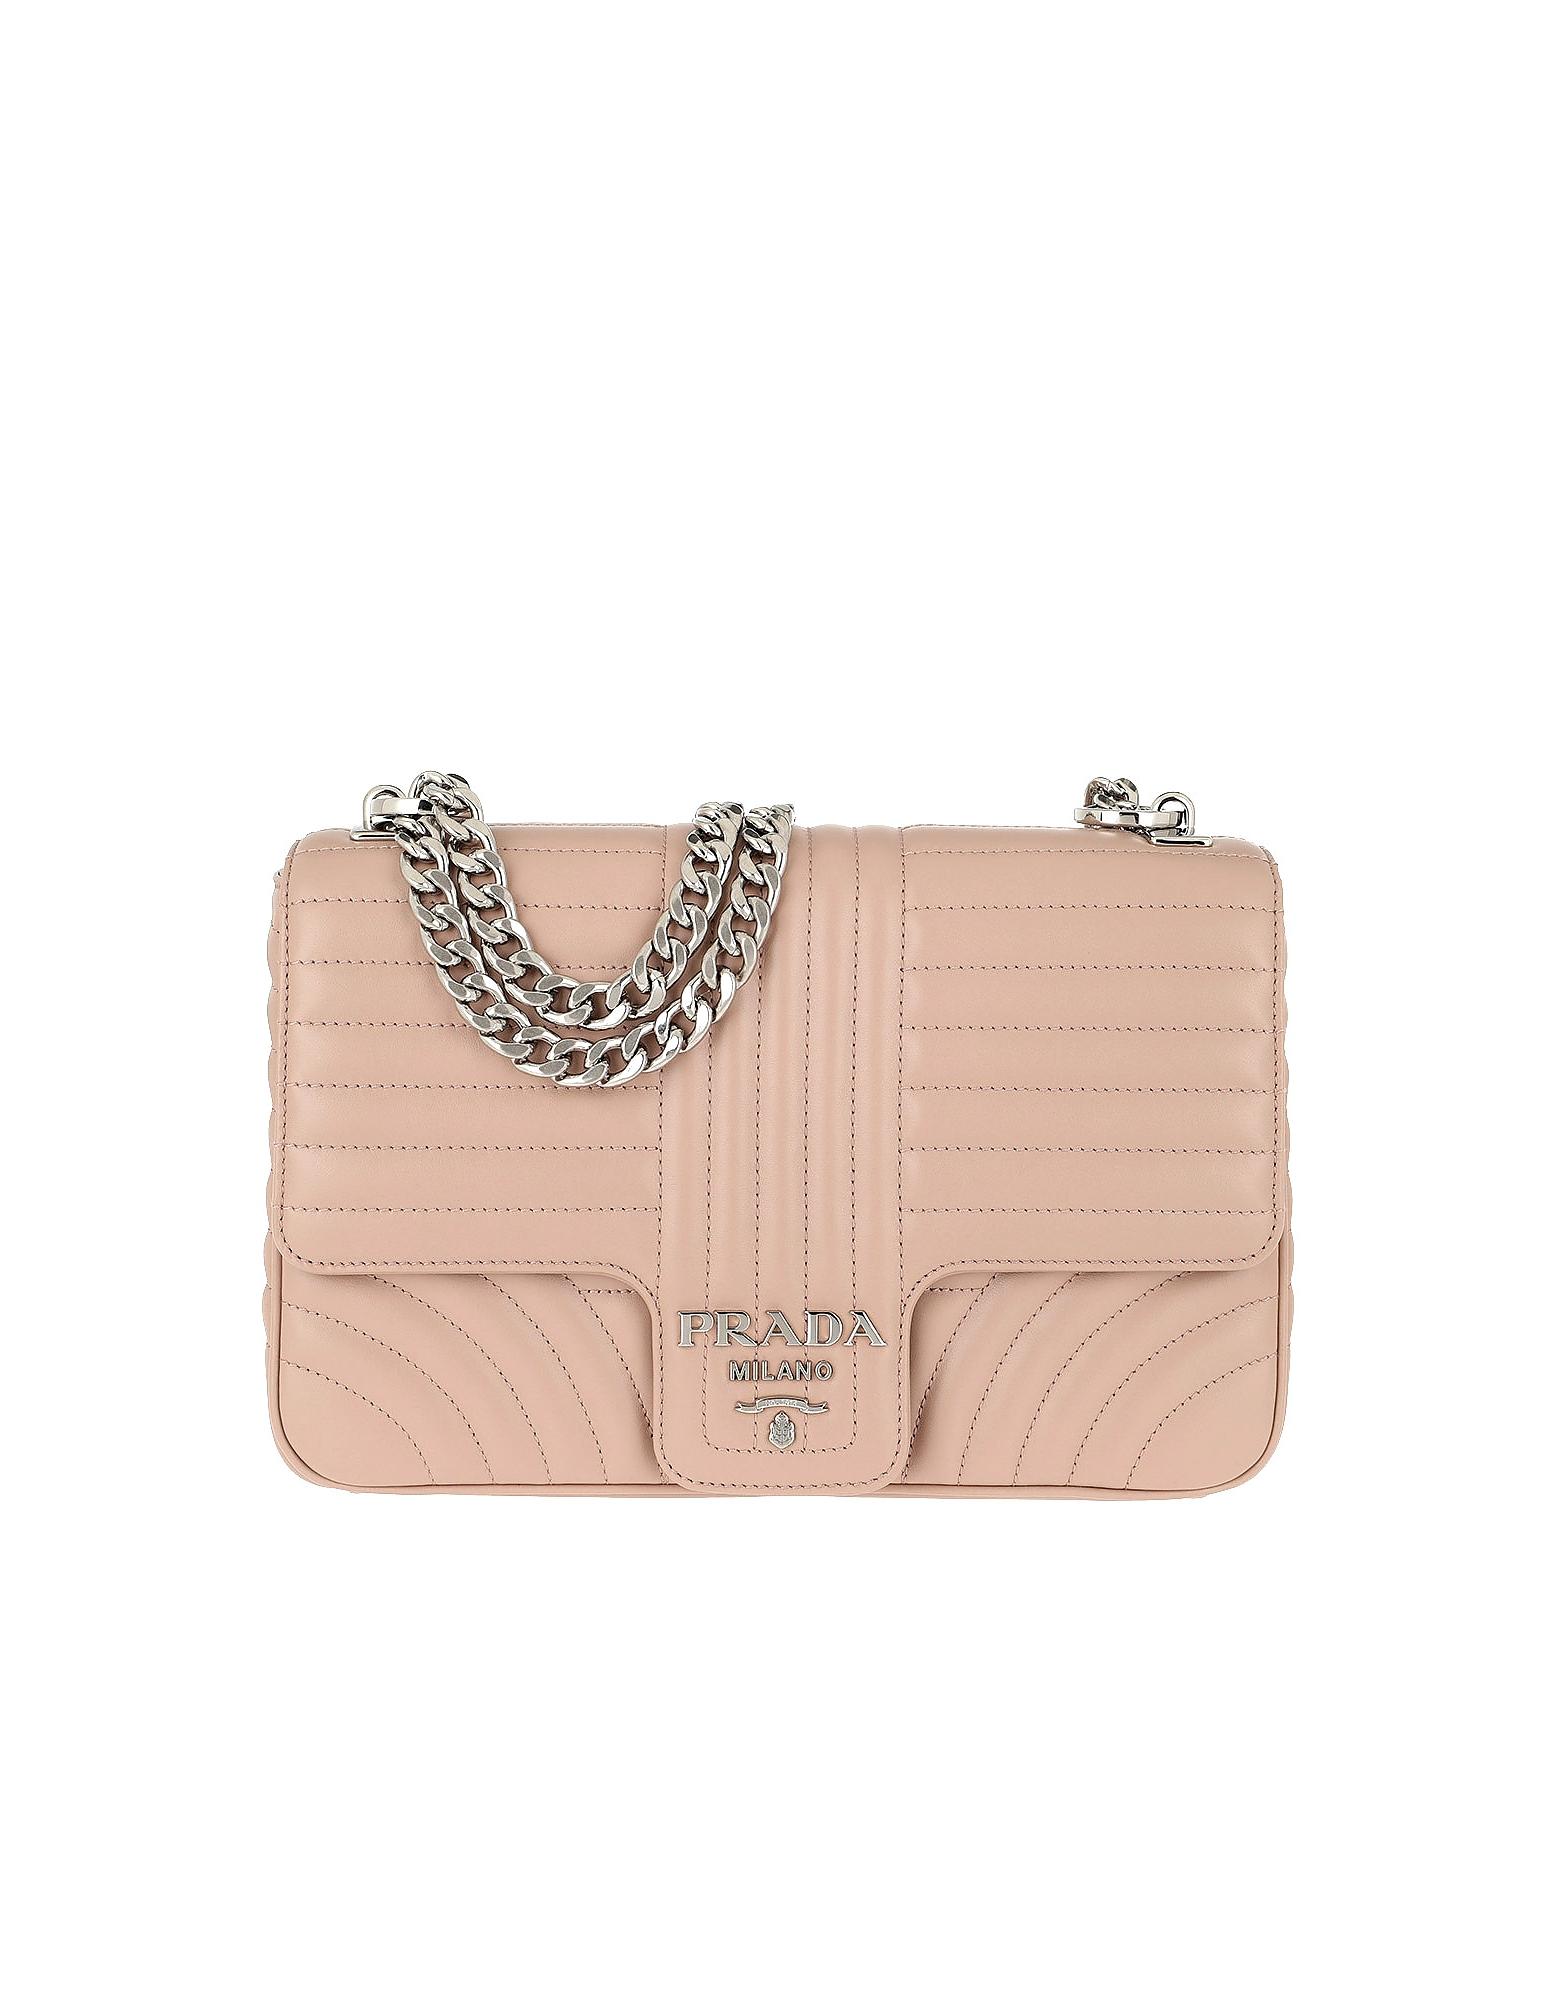 Prada Handbags, Diagramme Leather Shoulder Bag Cipria